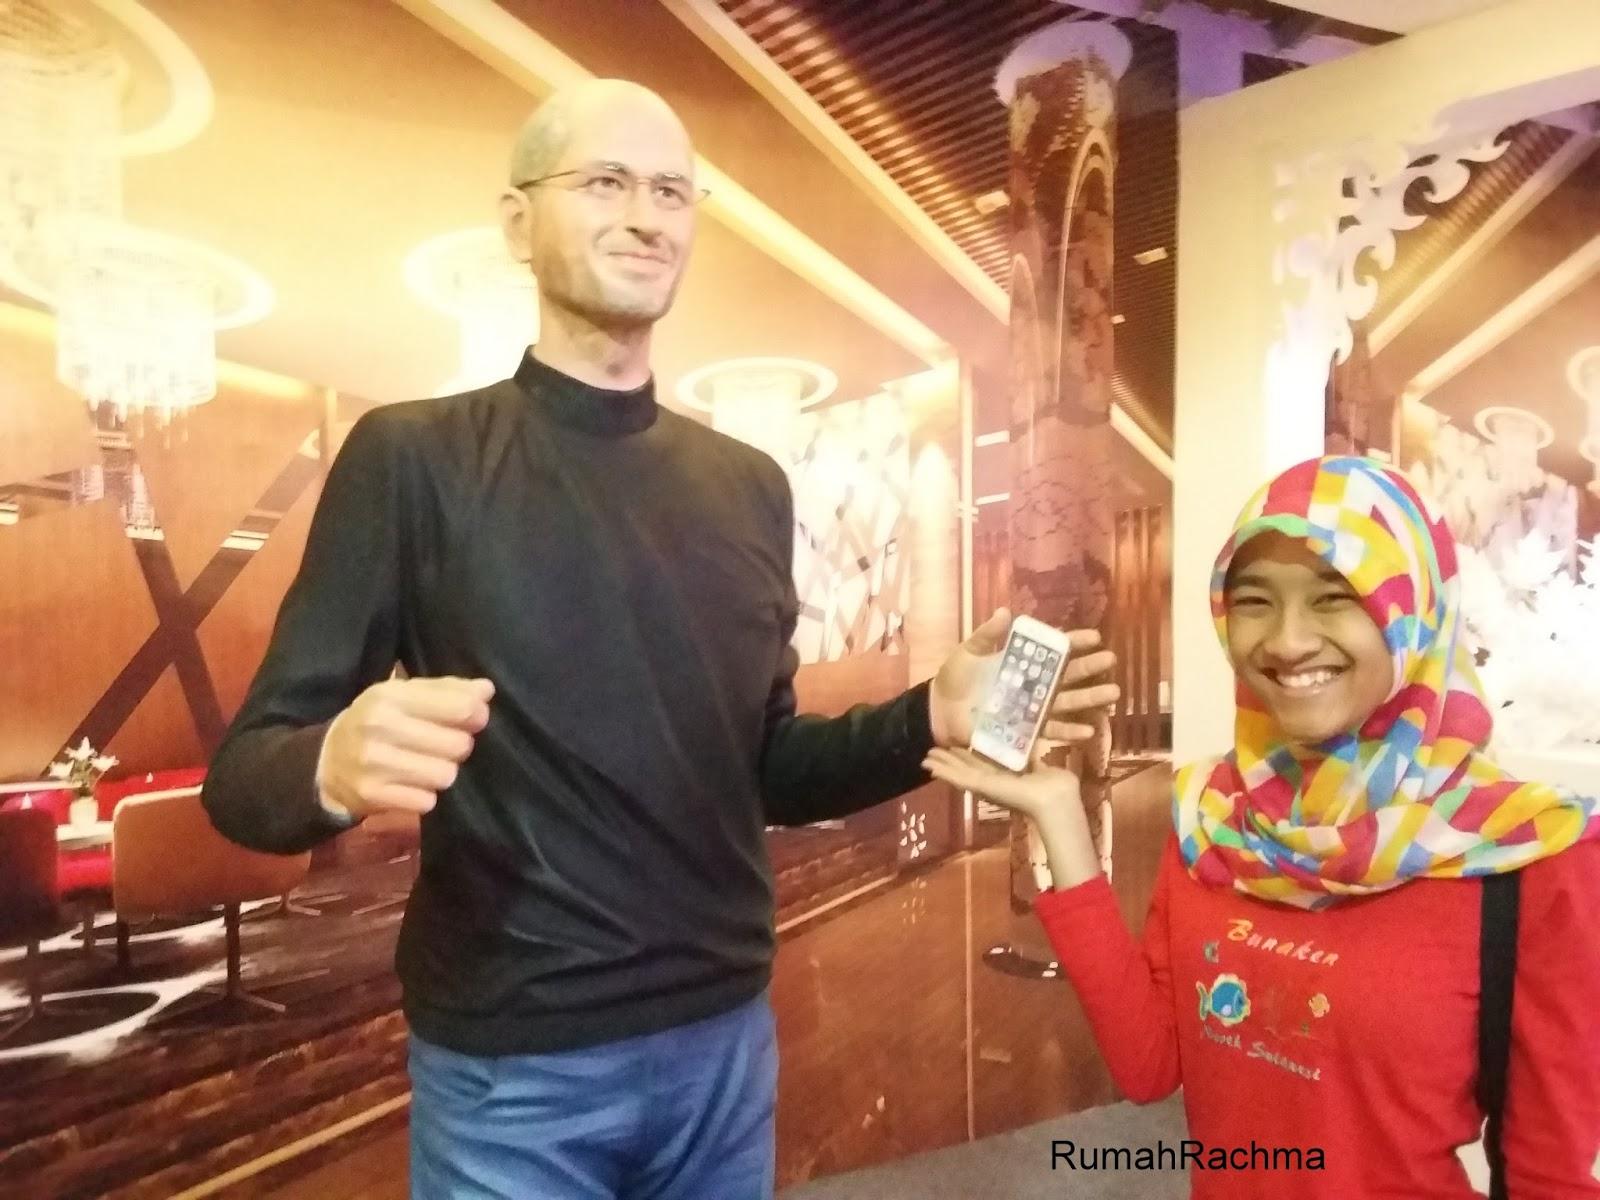 Selamat Datang Rumahrachma Gantengnya Sama Museum De Arca Kota Yogyakarta